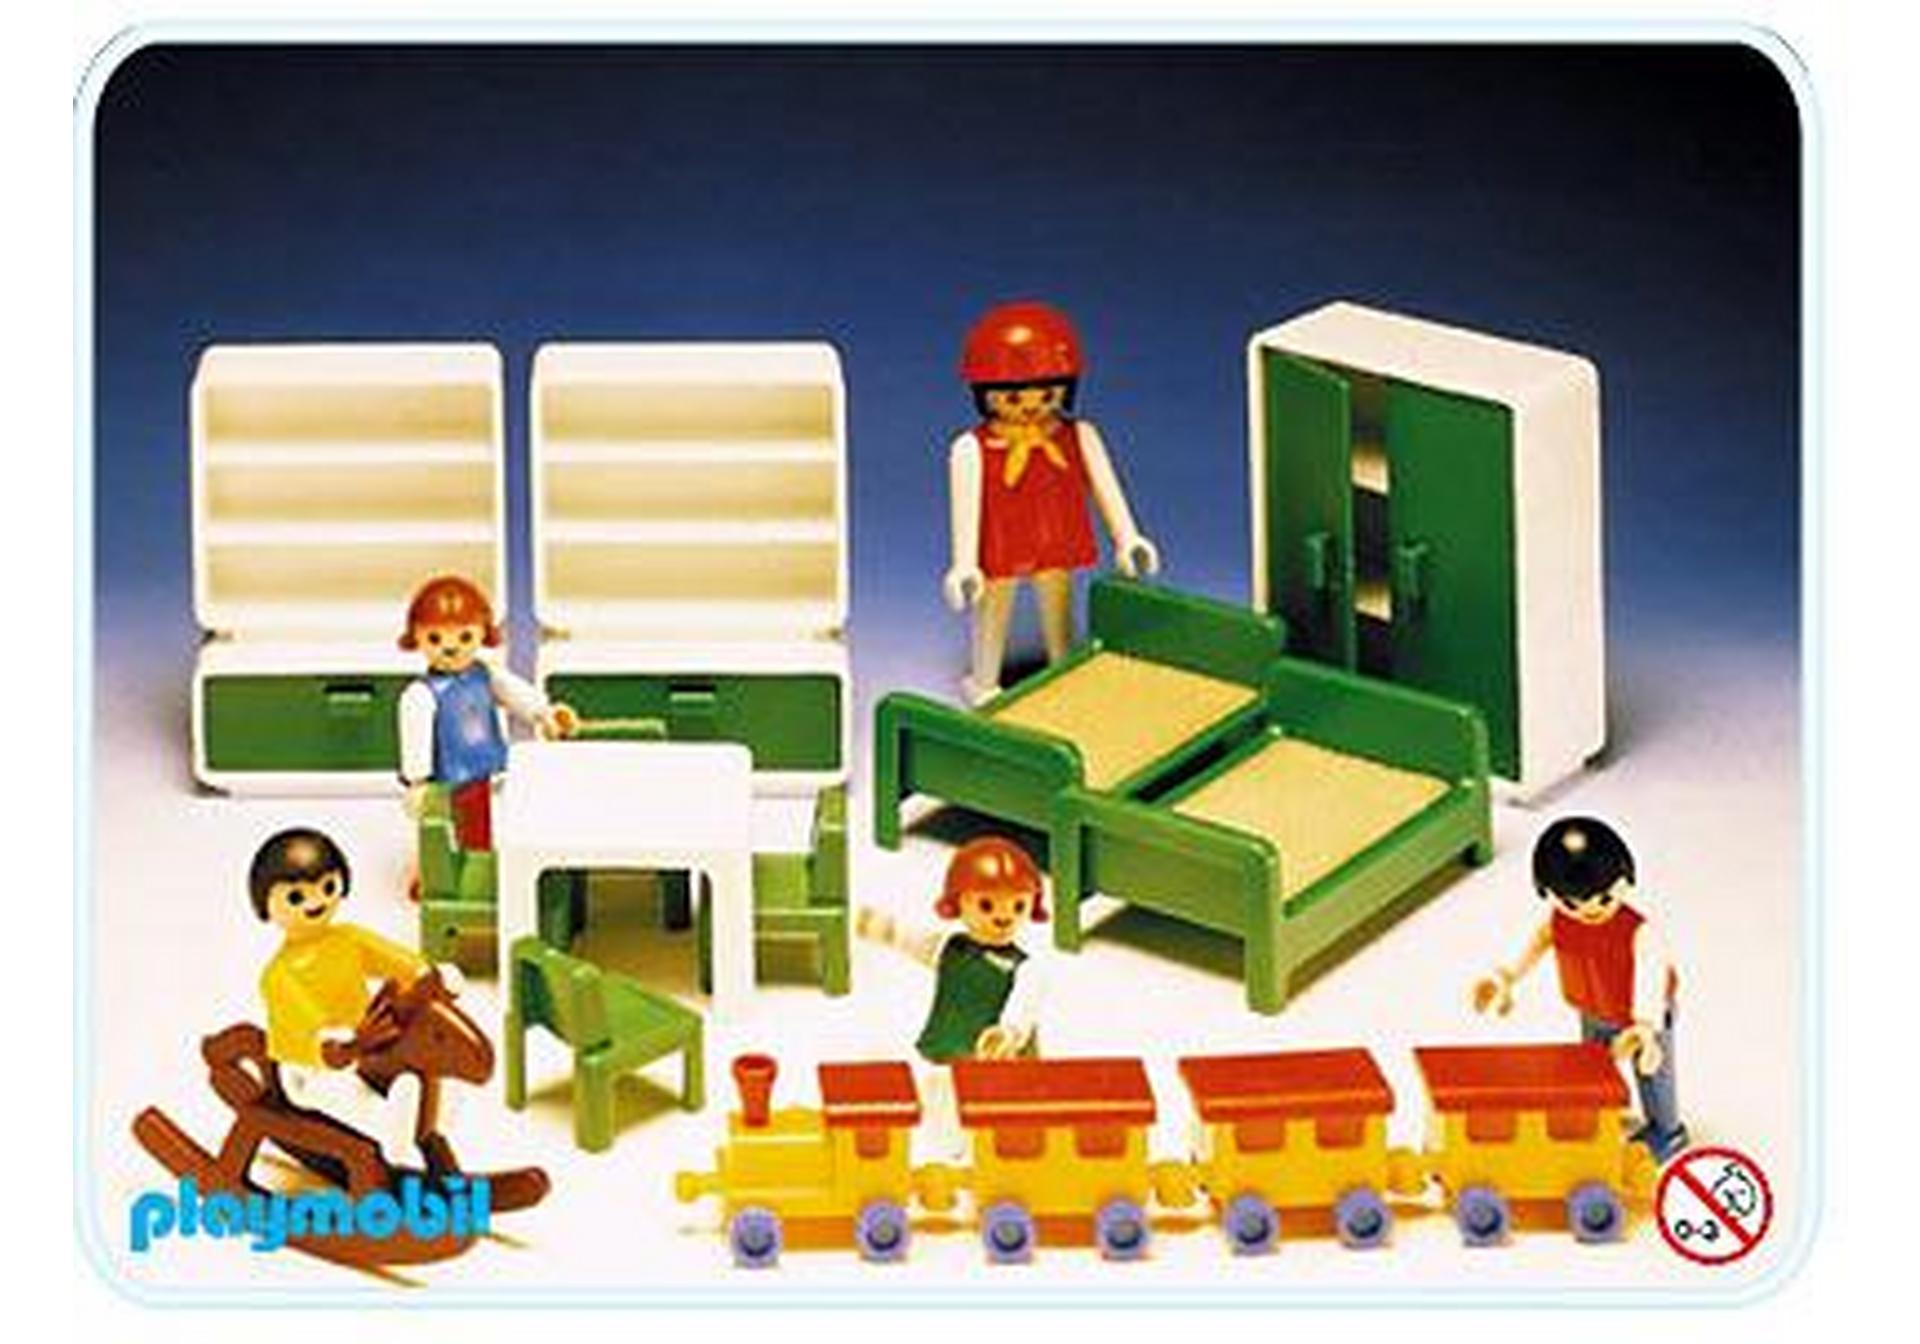 Chambre d 39 enfants 3417 a playmobil france - Playmobil chambre enfant ...